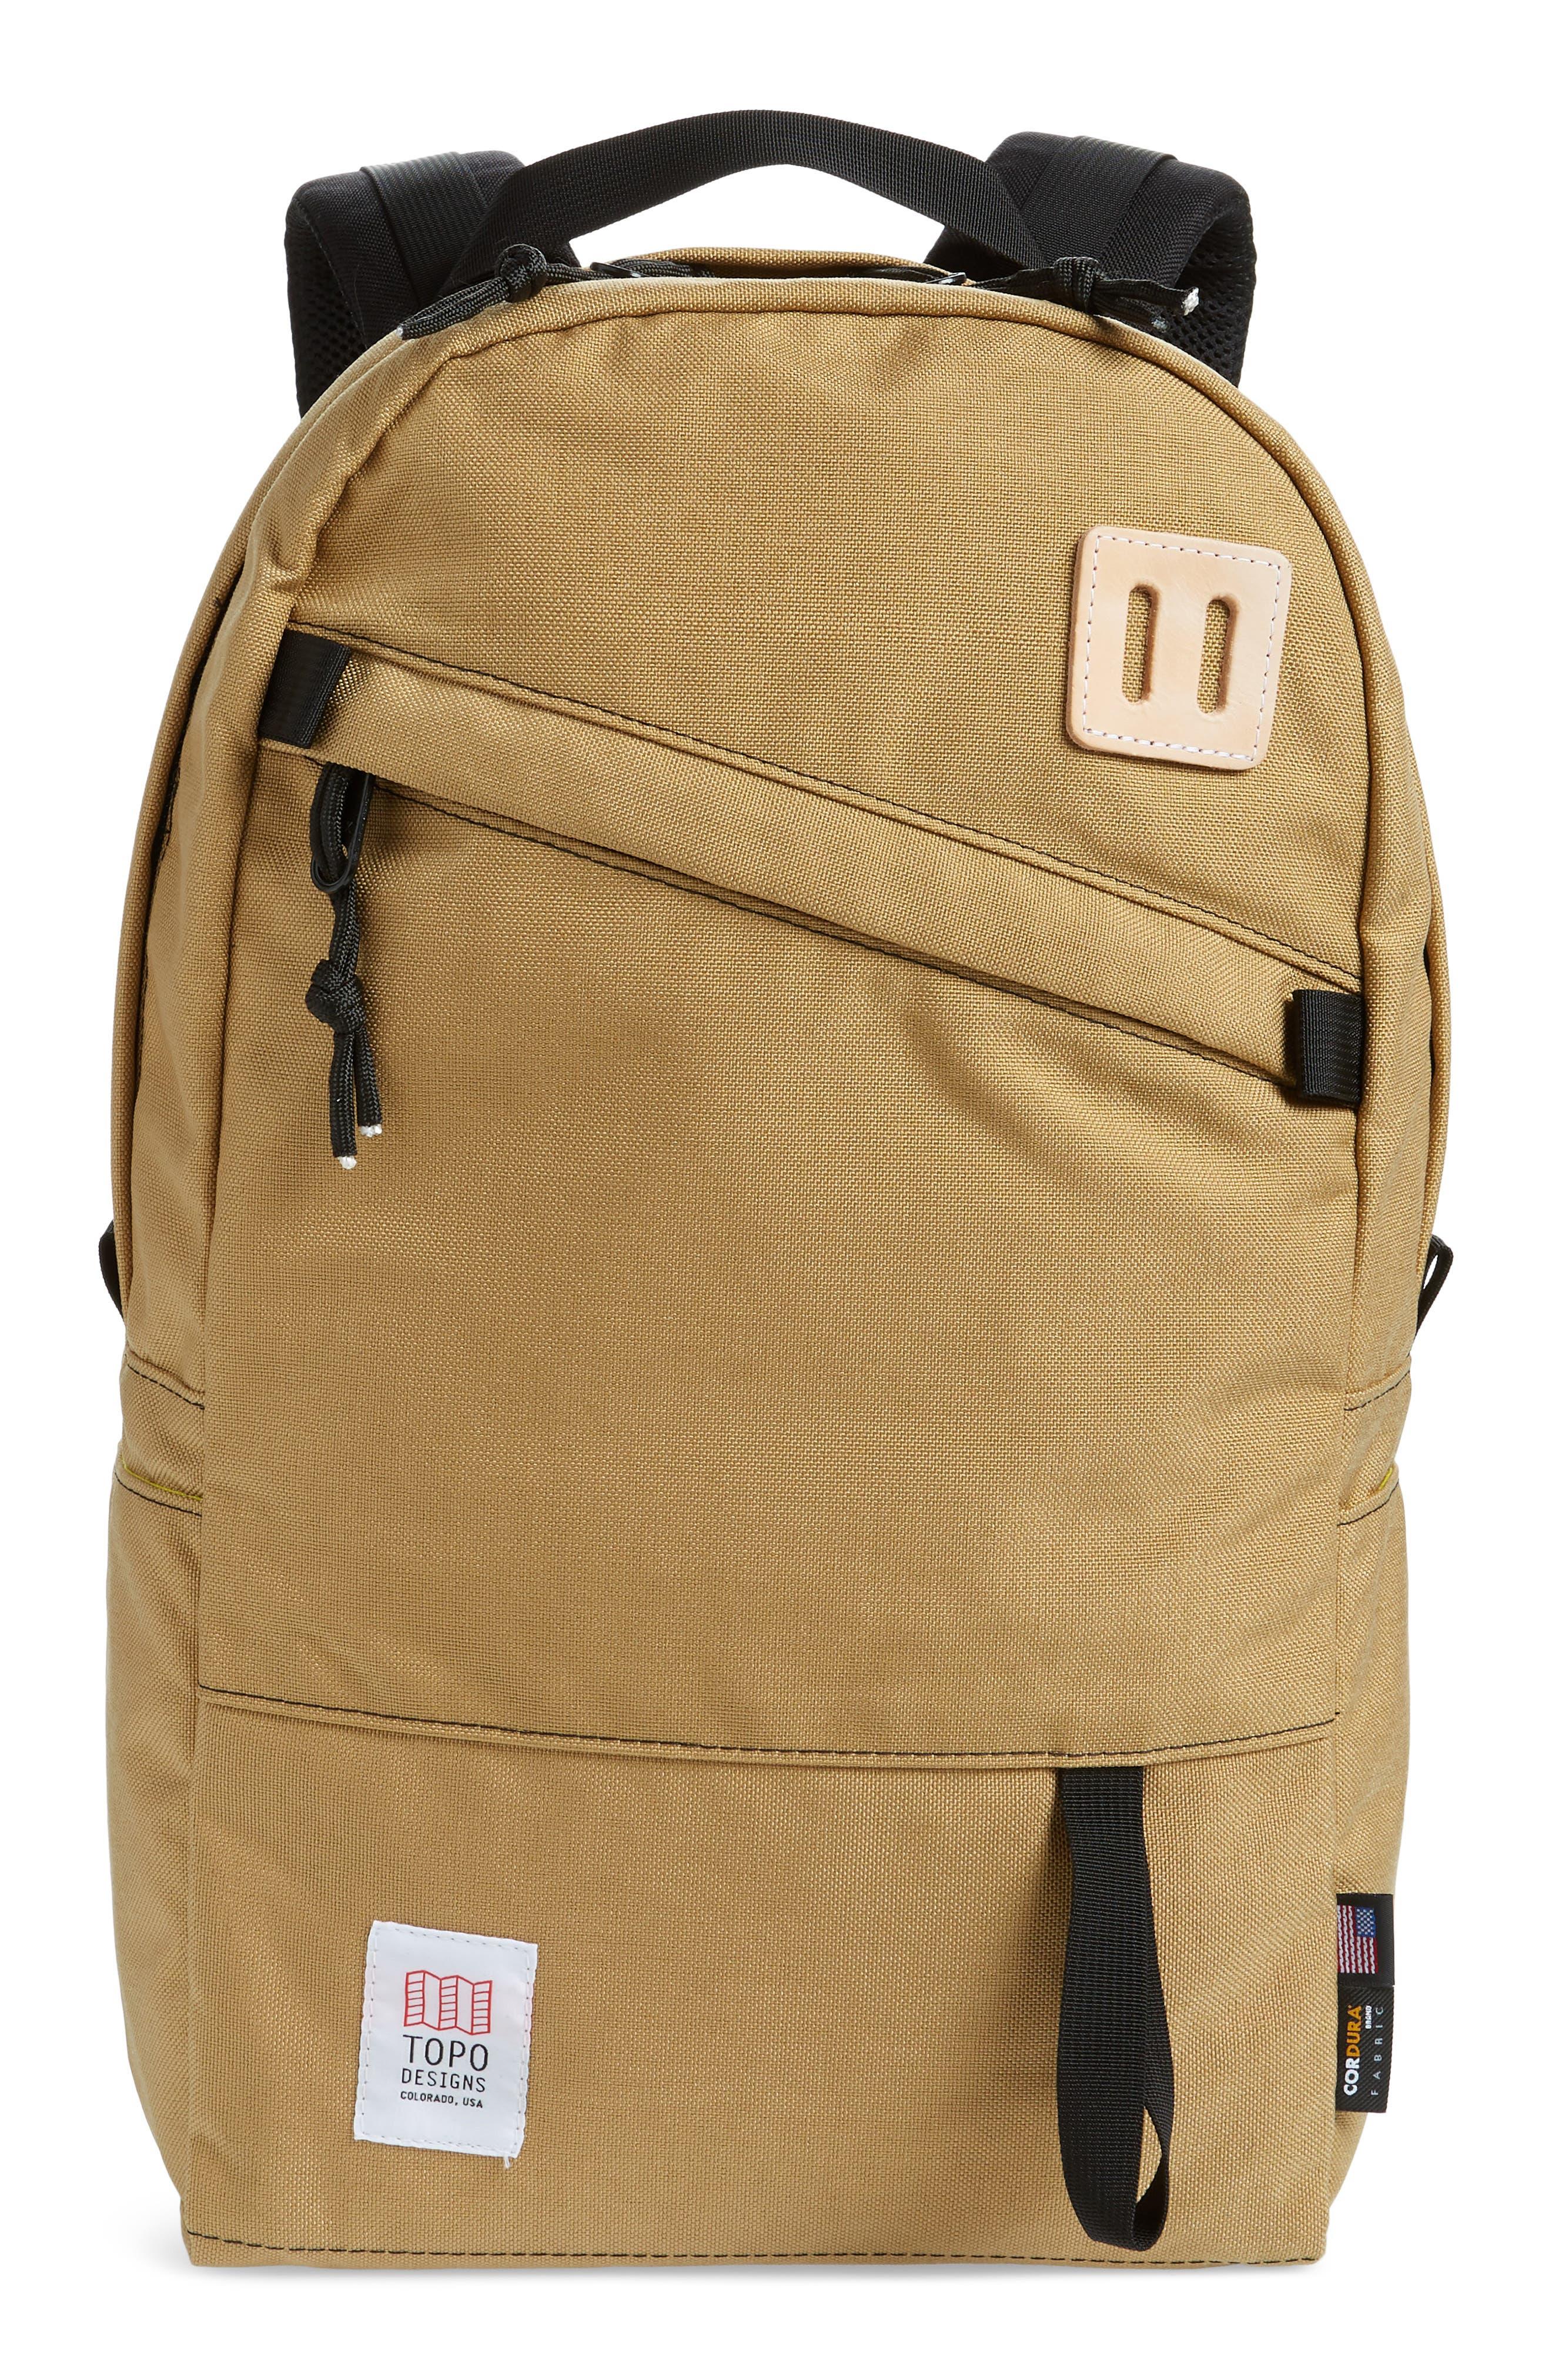 Topo Designs Daypack - Beige